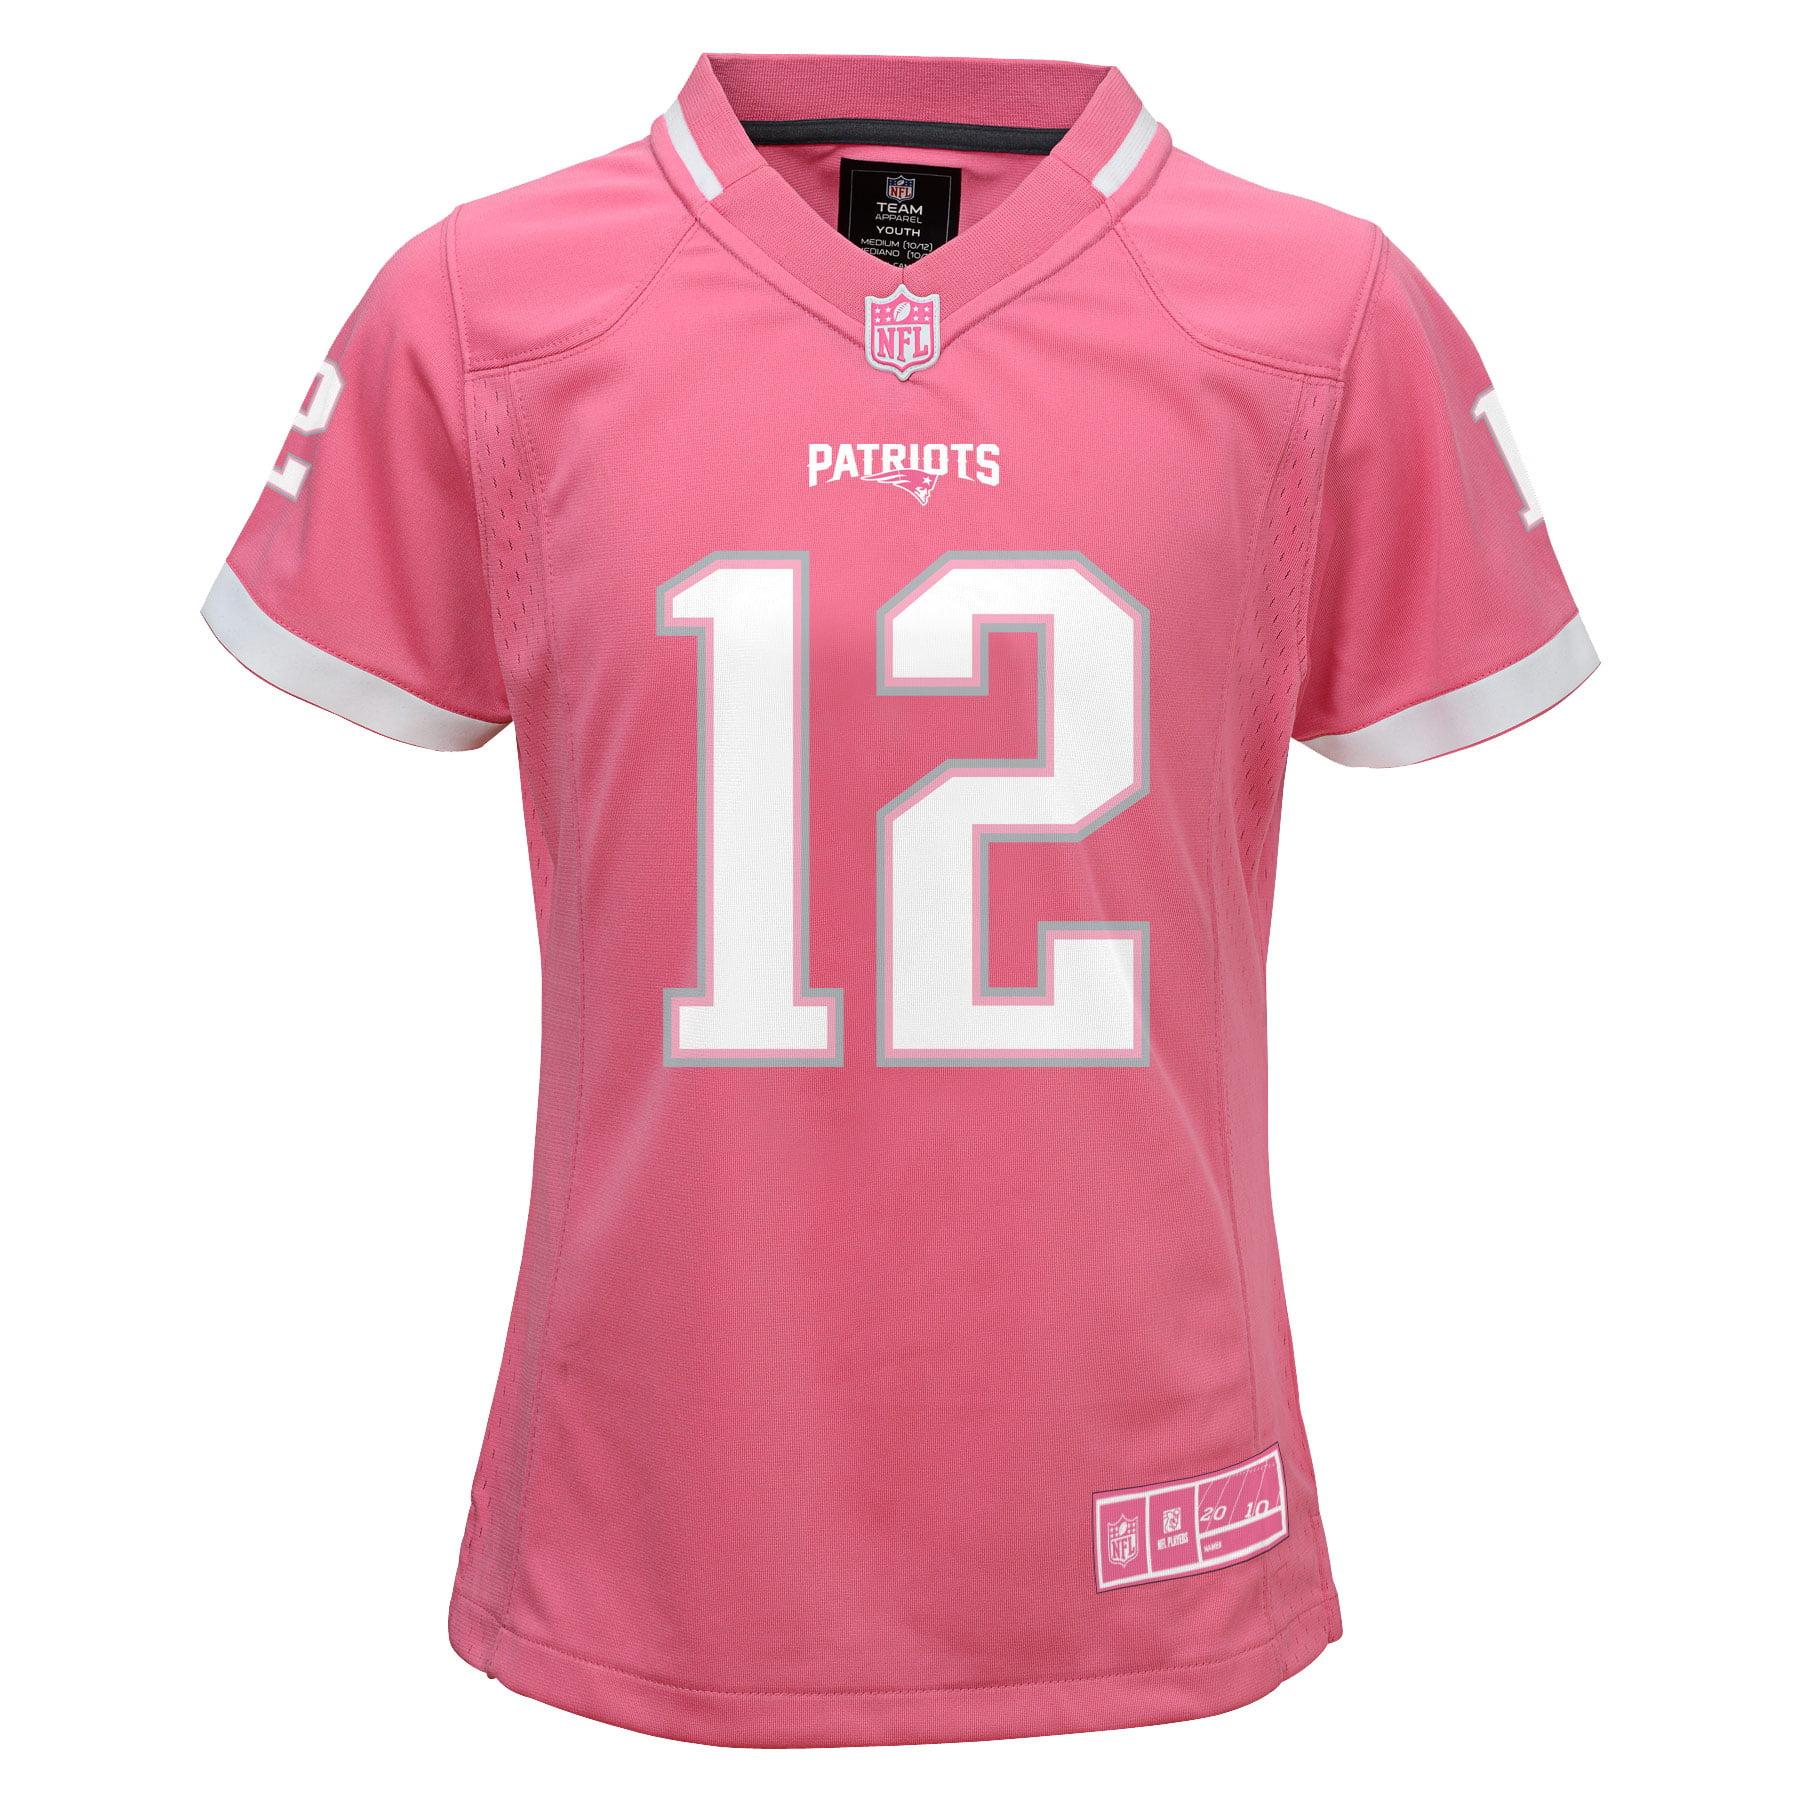 Tom Brady New England Patriots Girls Youth Bubble Gum Jersey - Pink